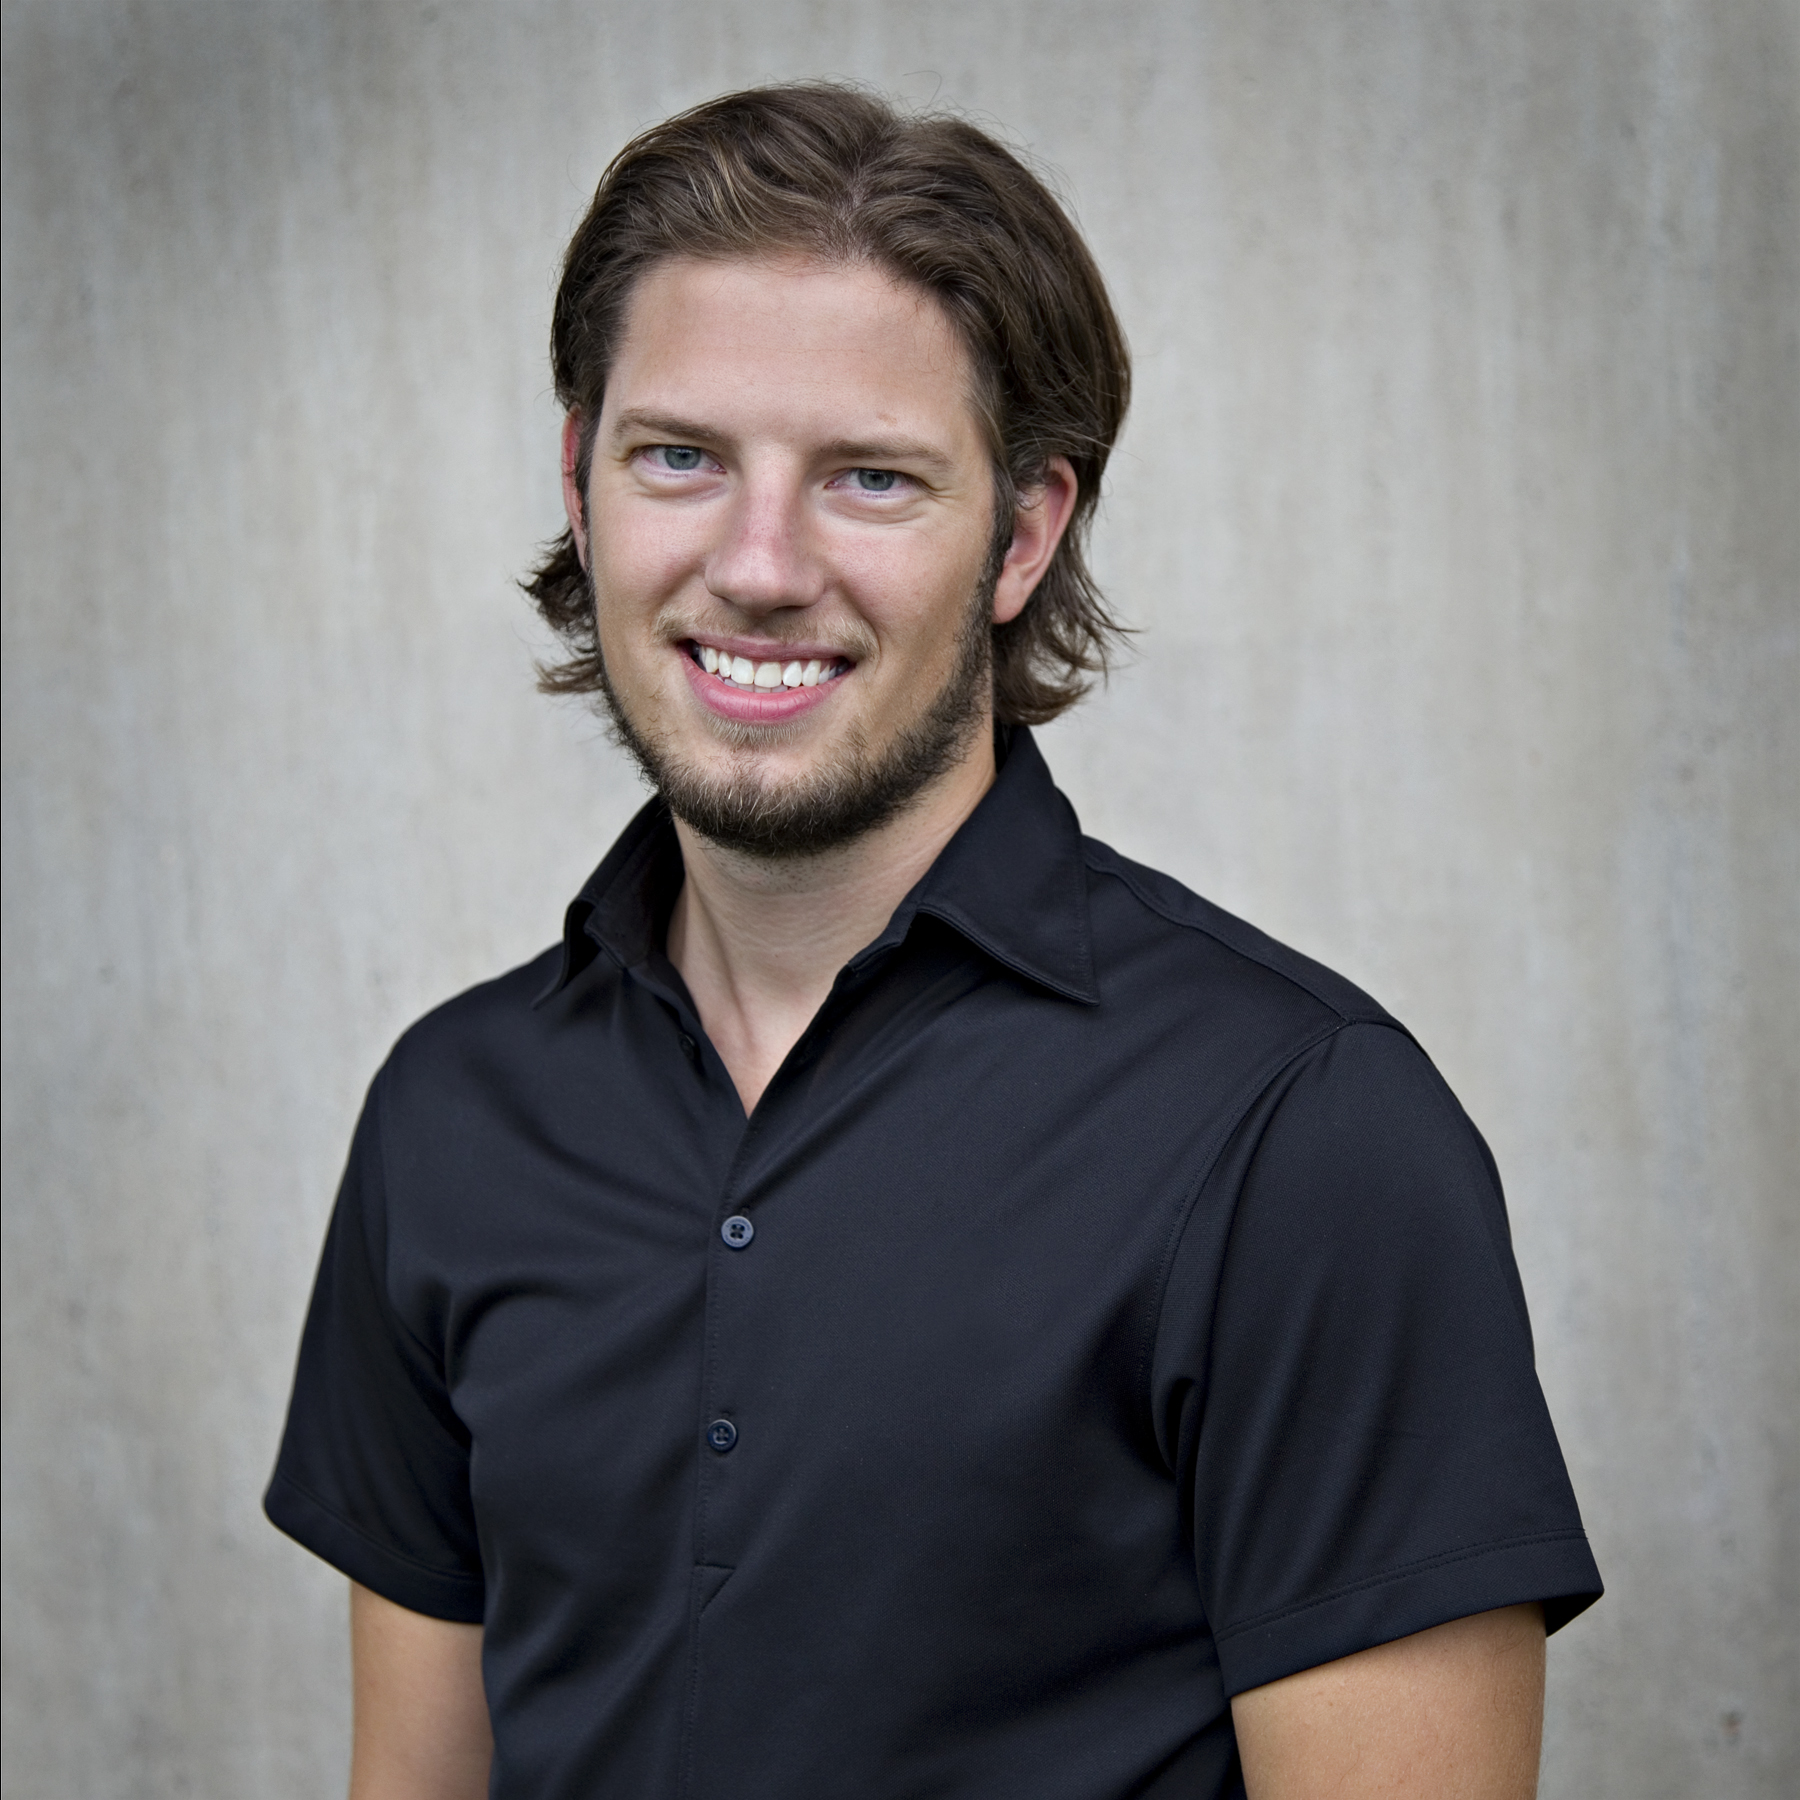 Alexander Lööf